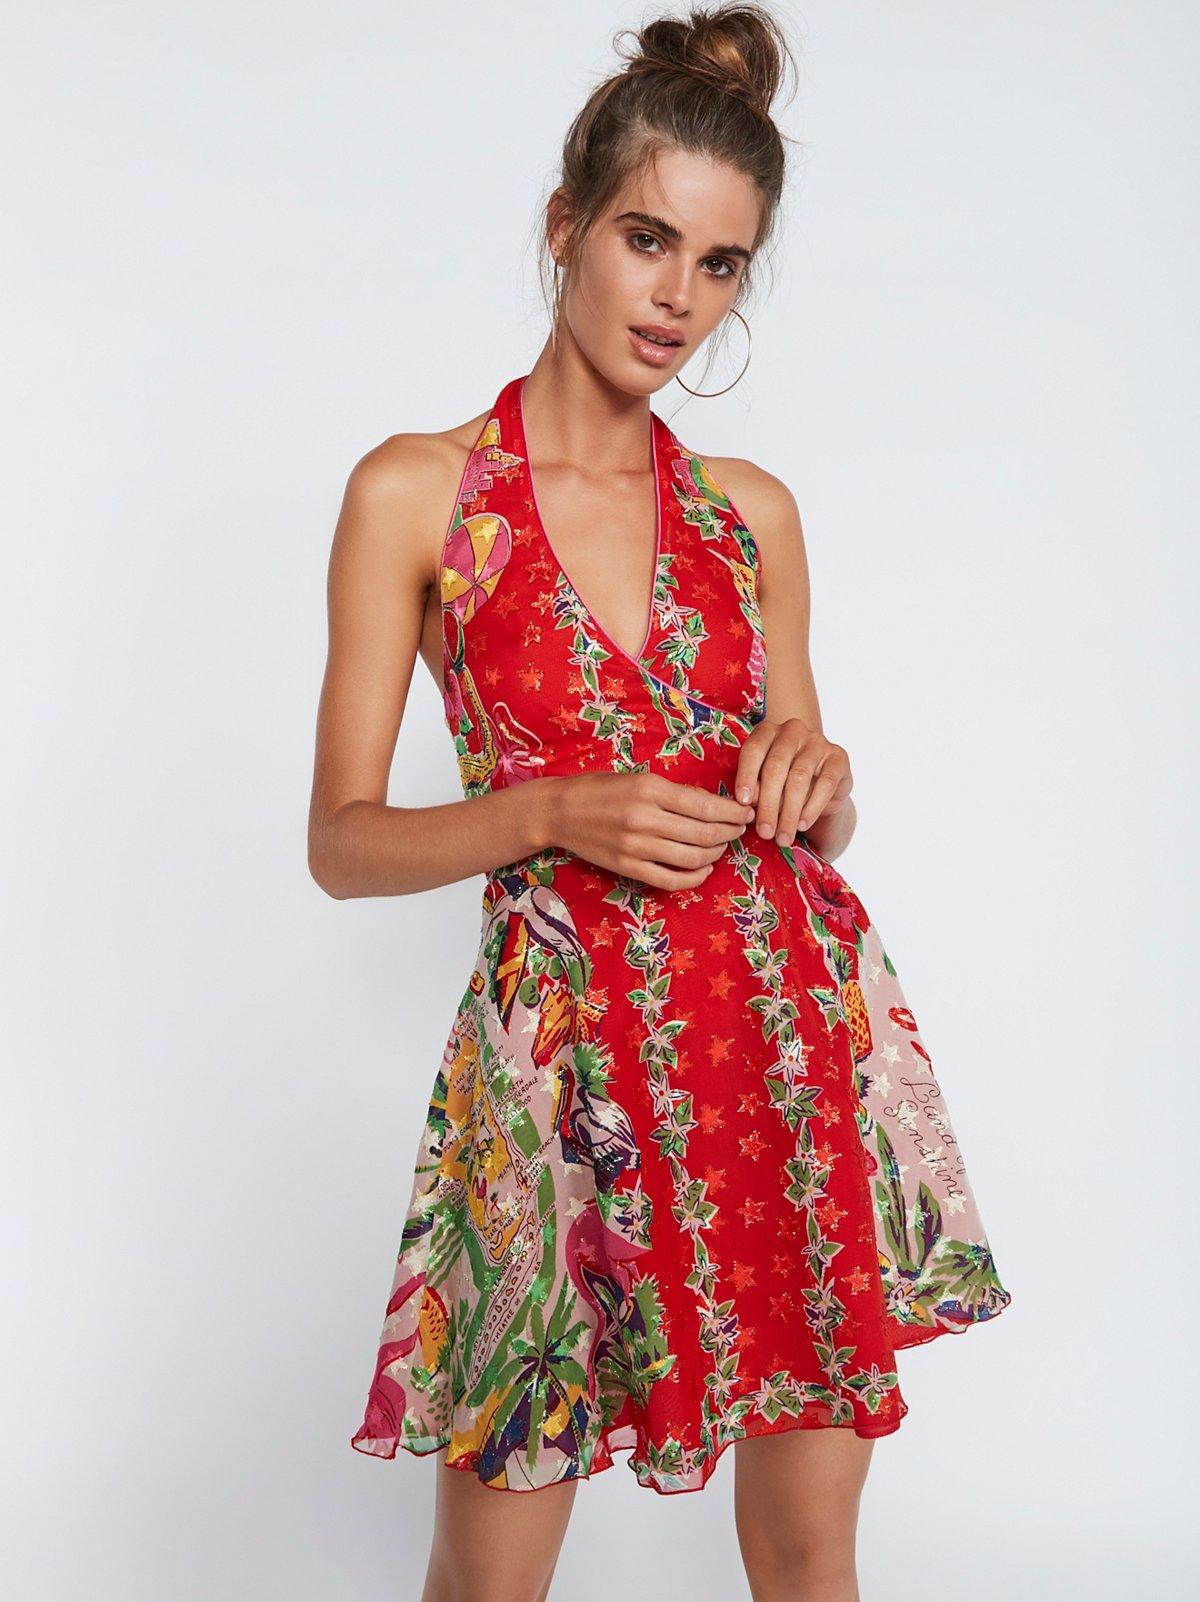 Land of Sunshine Dress